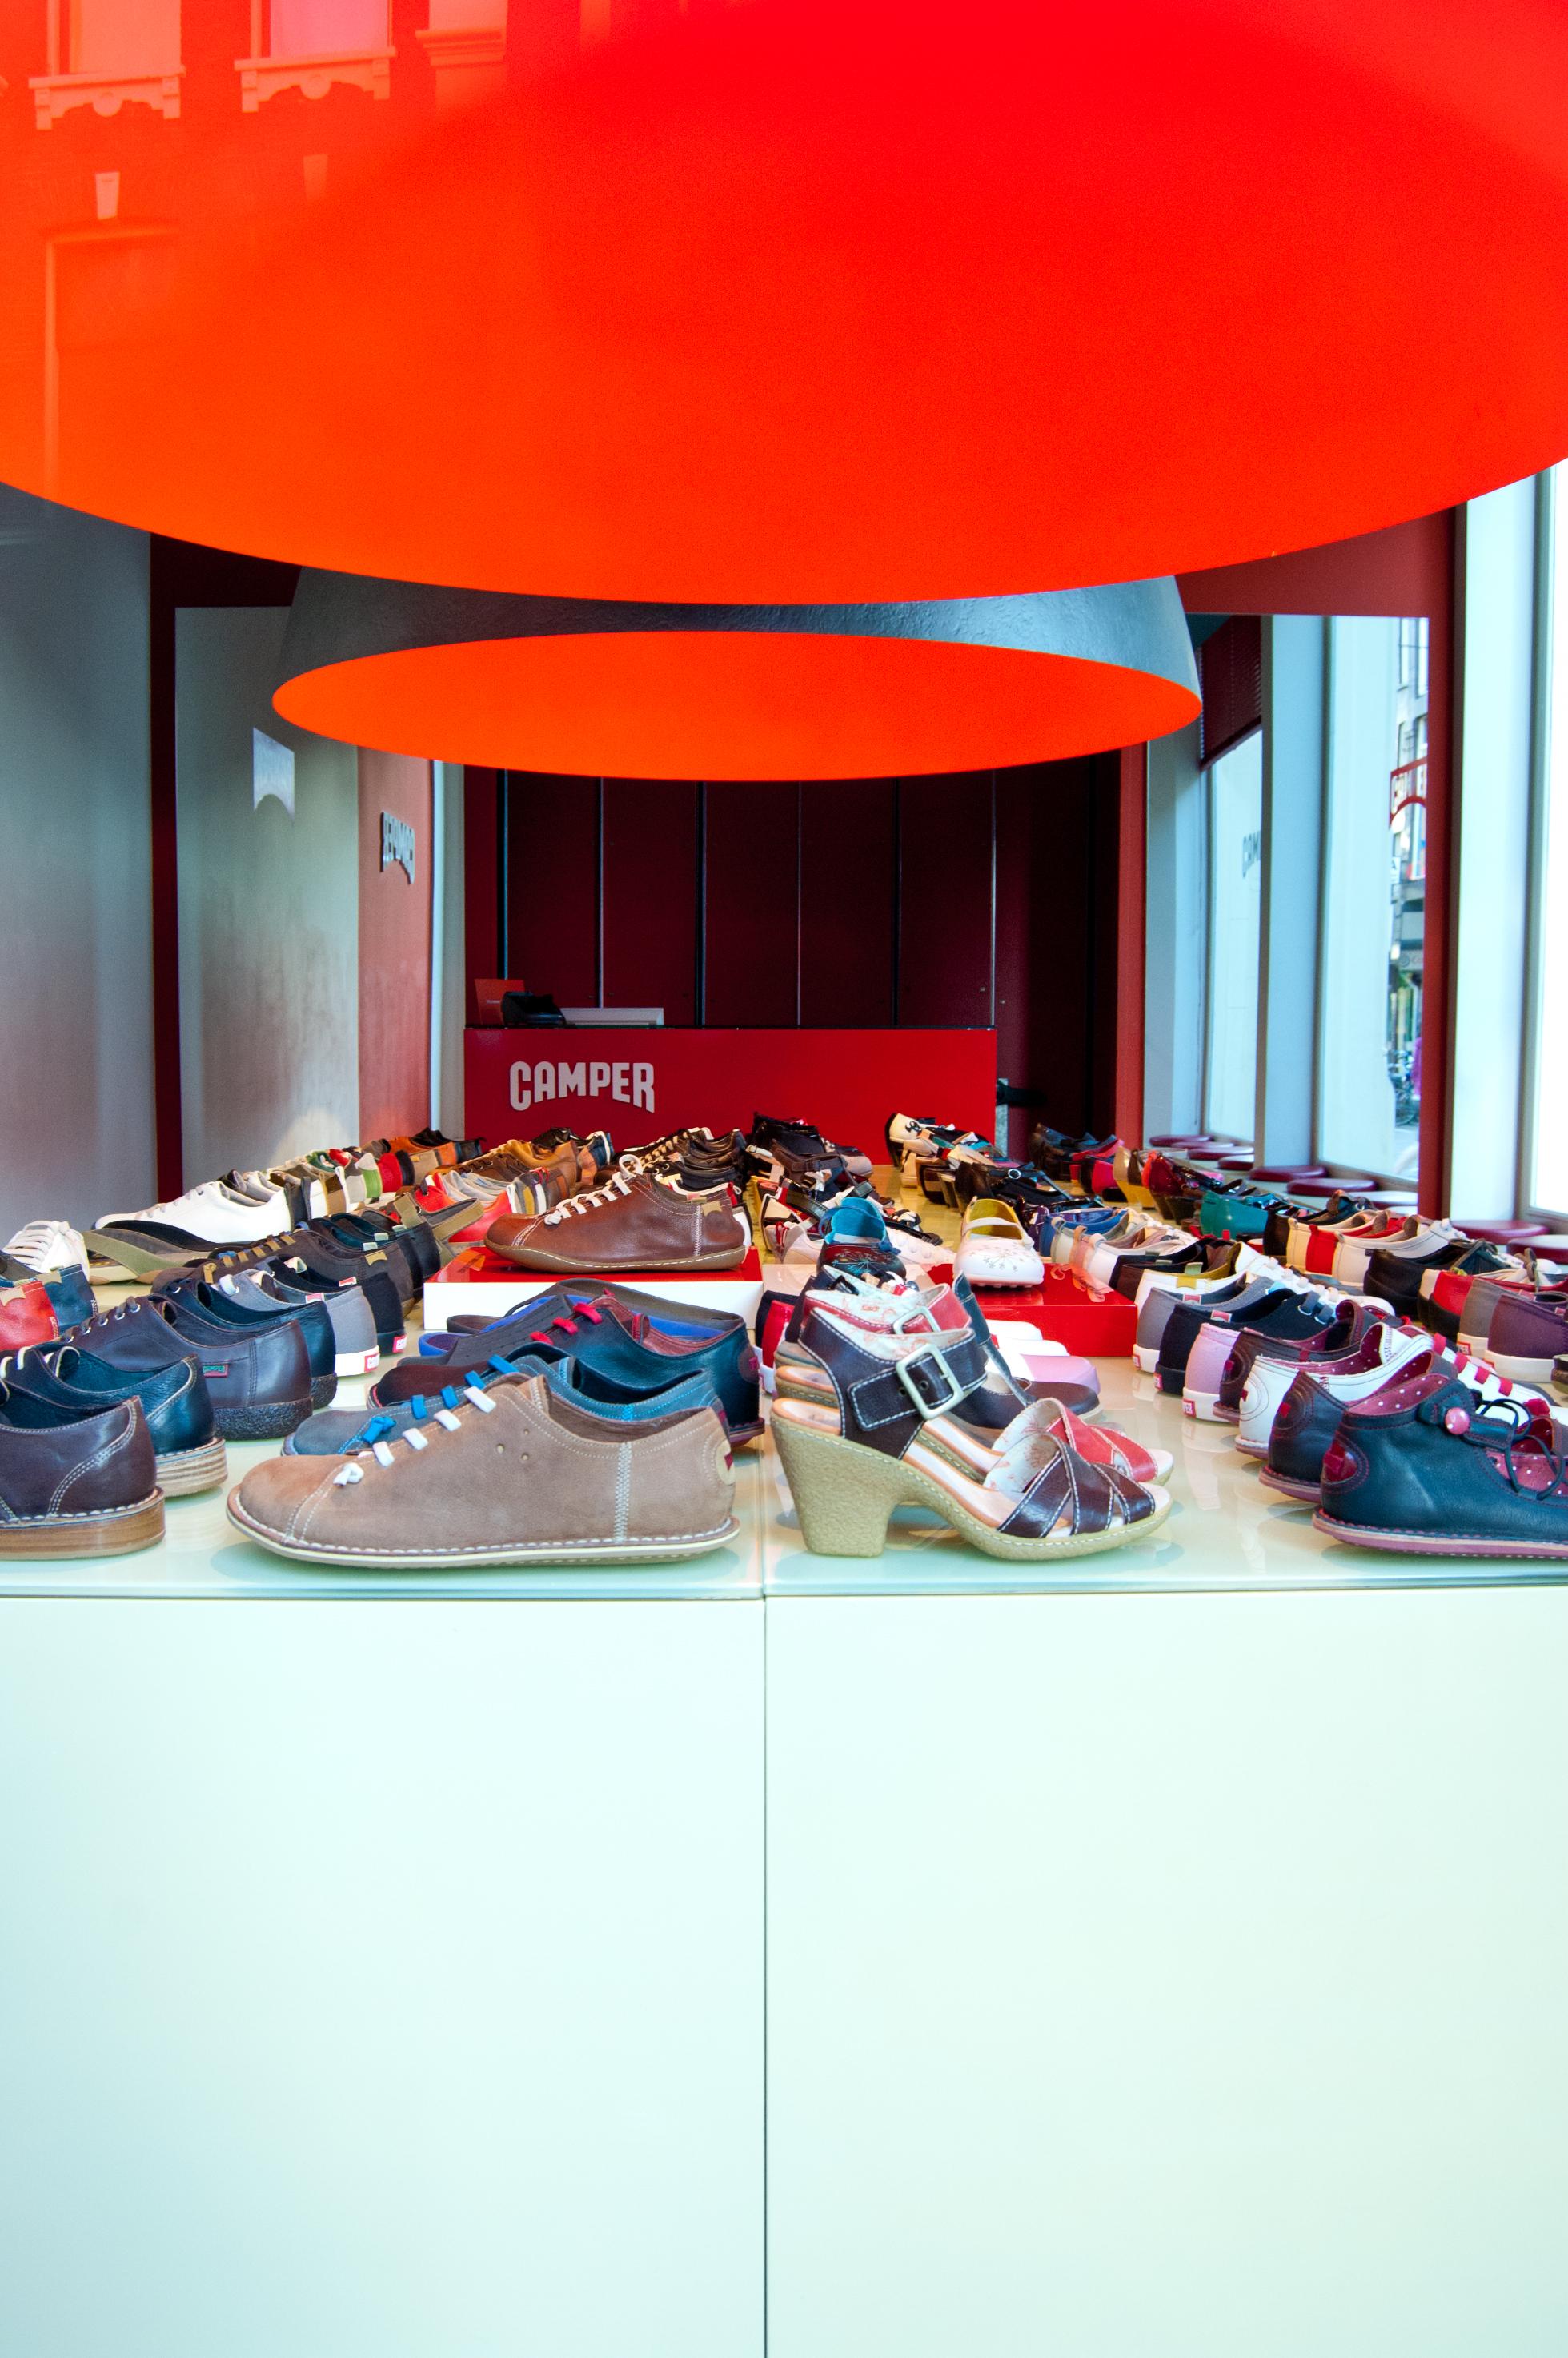 Camper Shoe Store Chicago